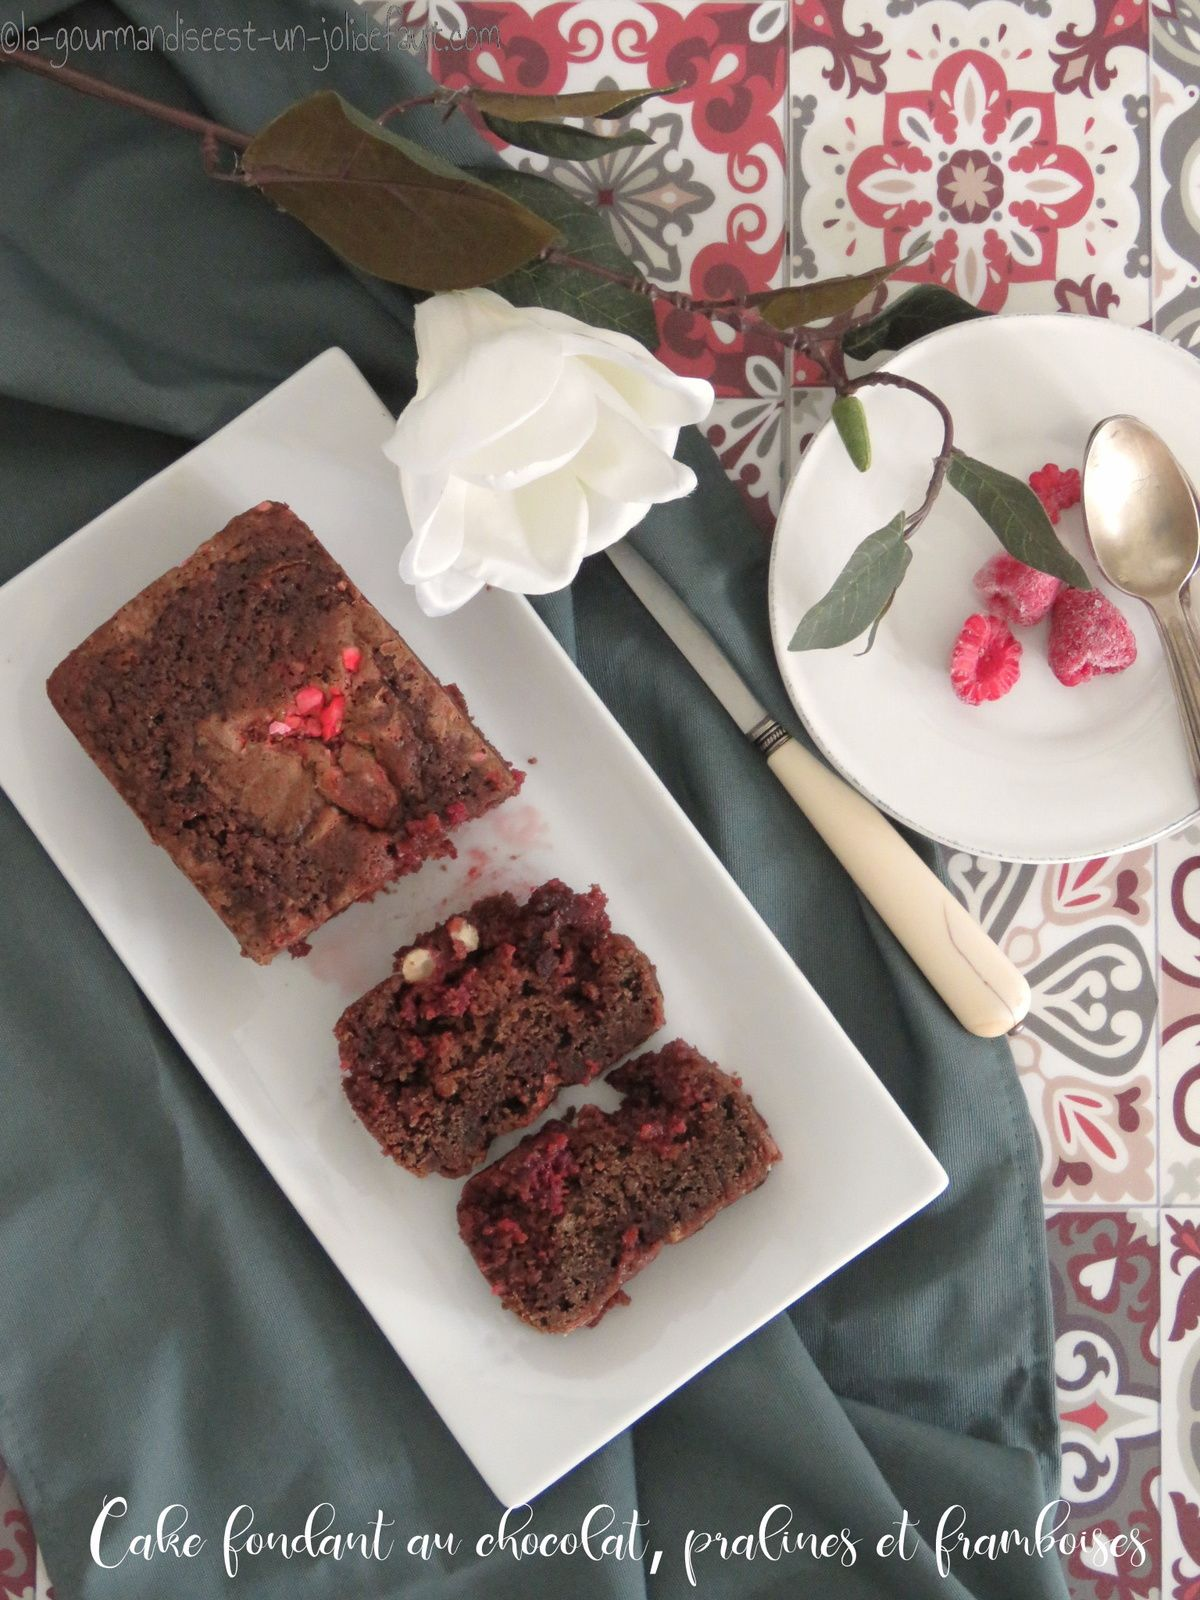 Cake fondant au chocolat, framboises et pralines